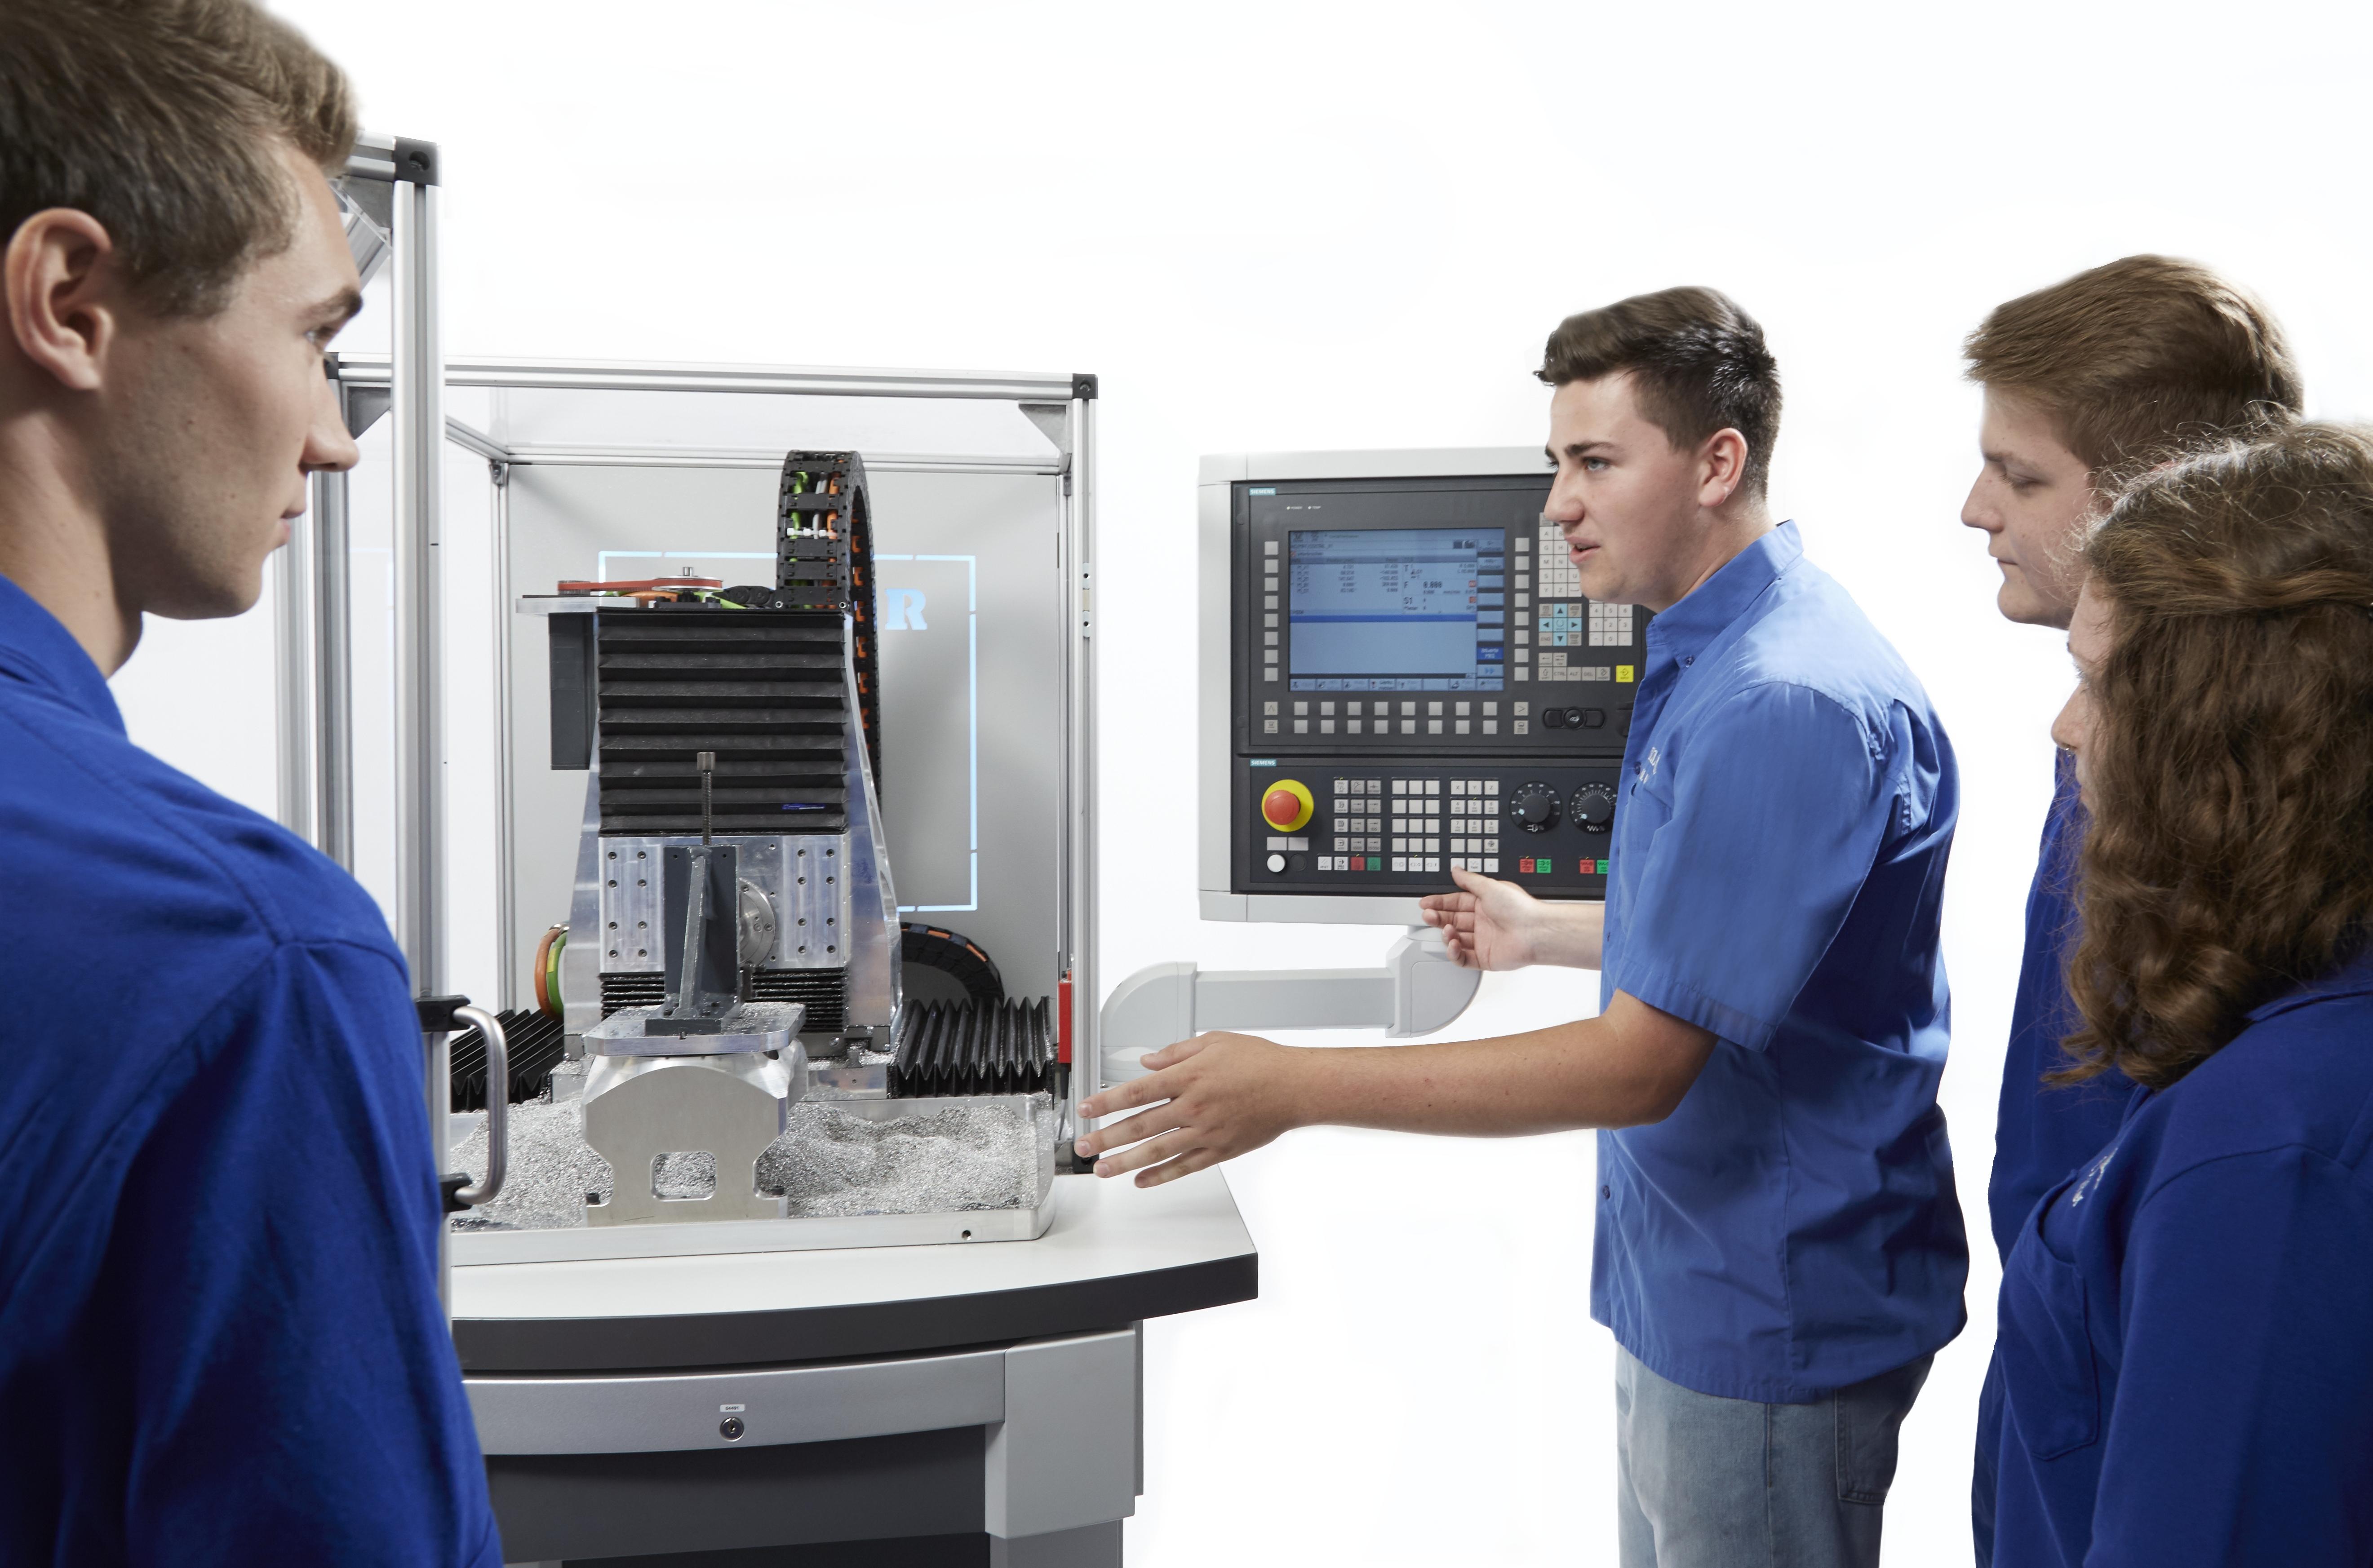 Profitrainer Training Machine, Source: Heller